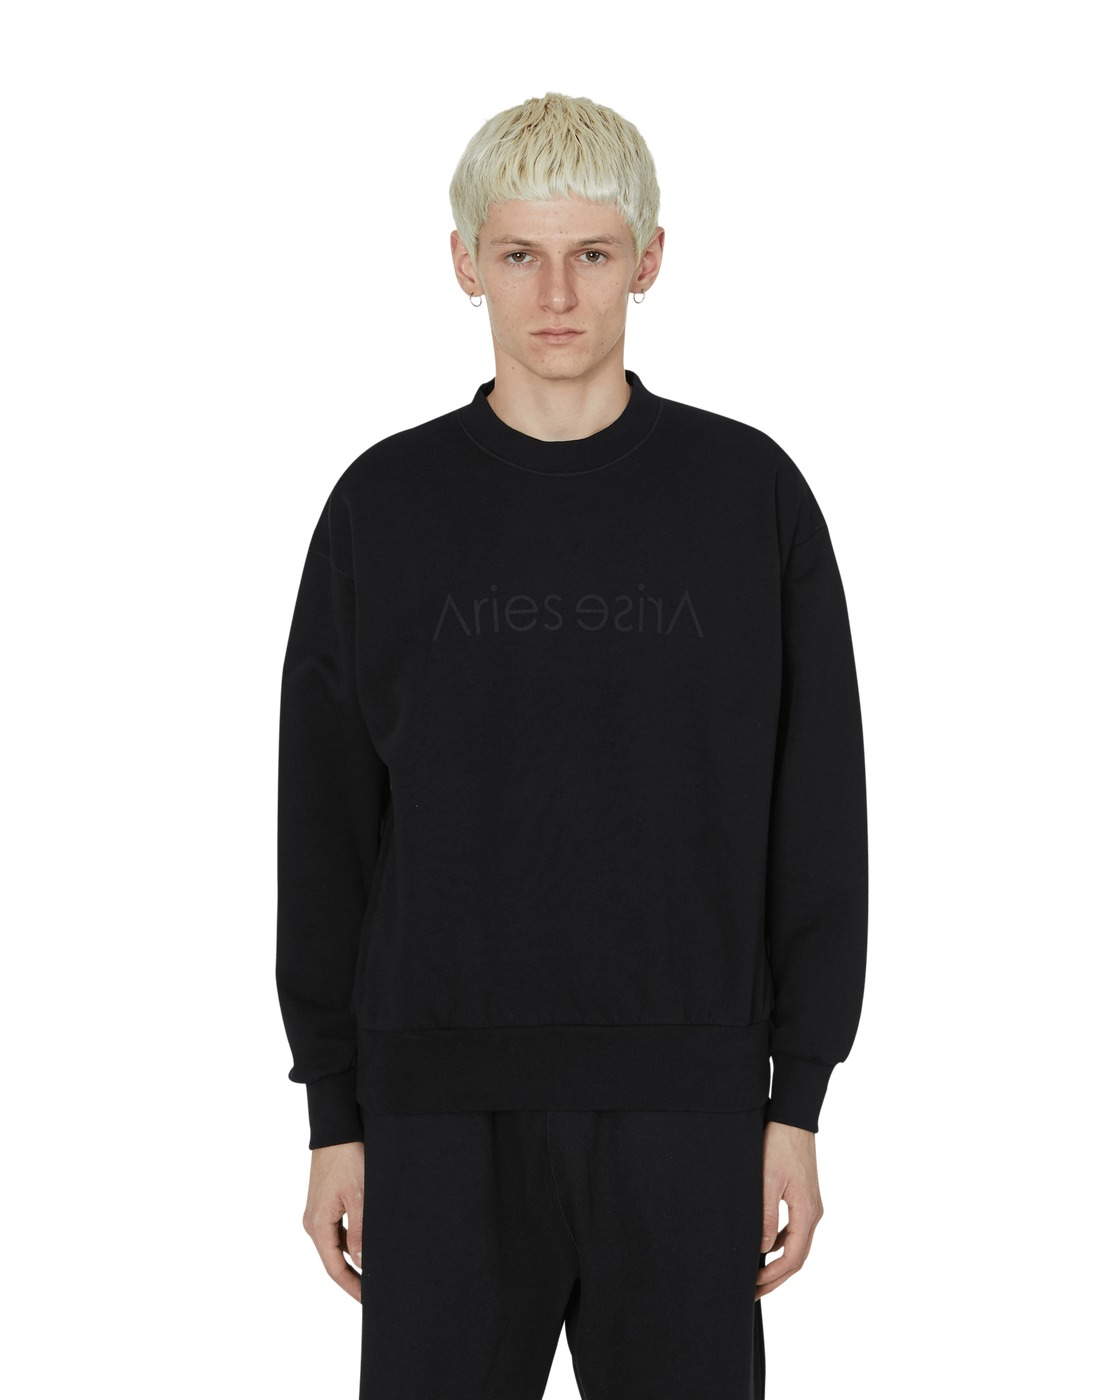 Aries Sans Print Crewneck Sweatshirt Black